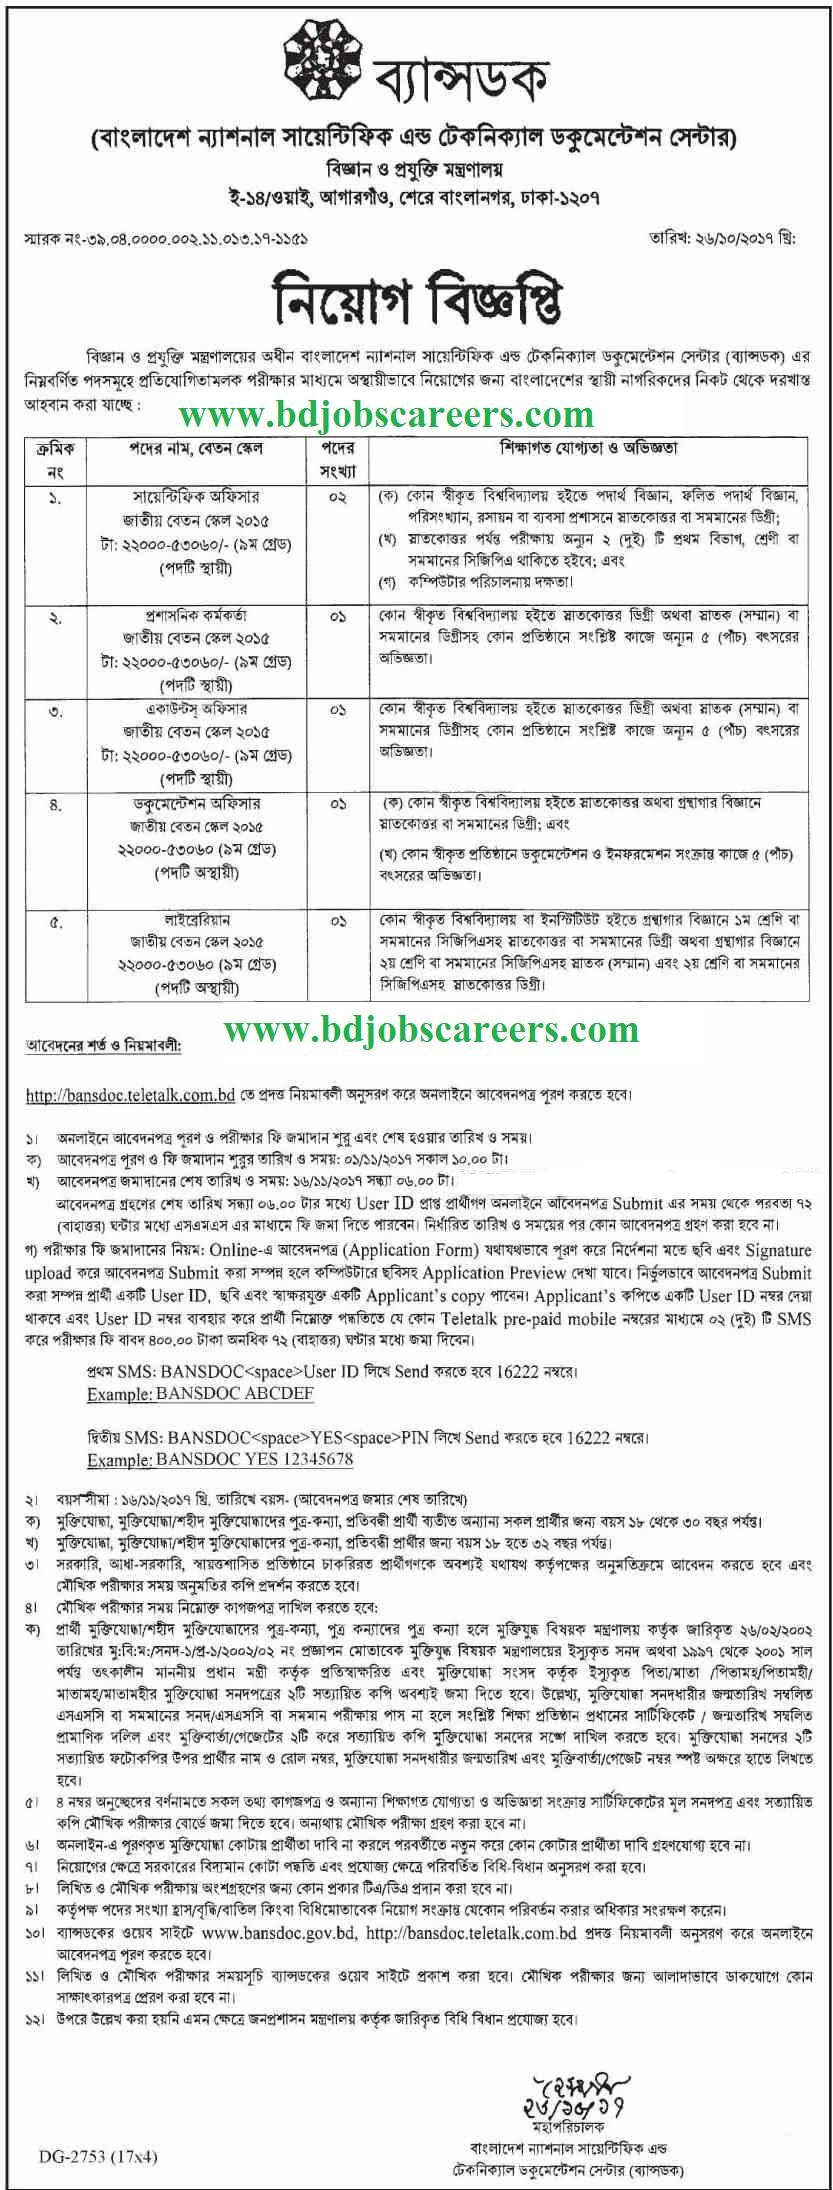 National Institute of Biotechnology Job Circular 2017